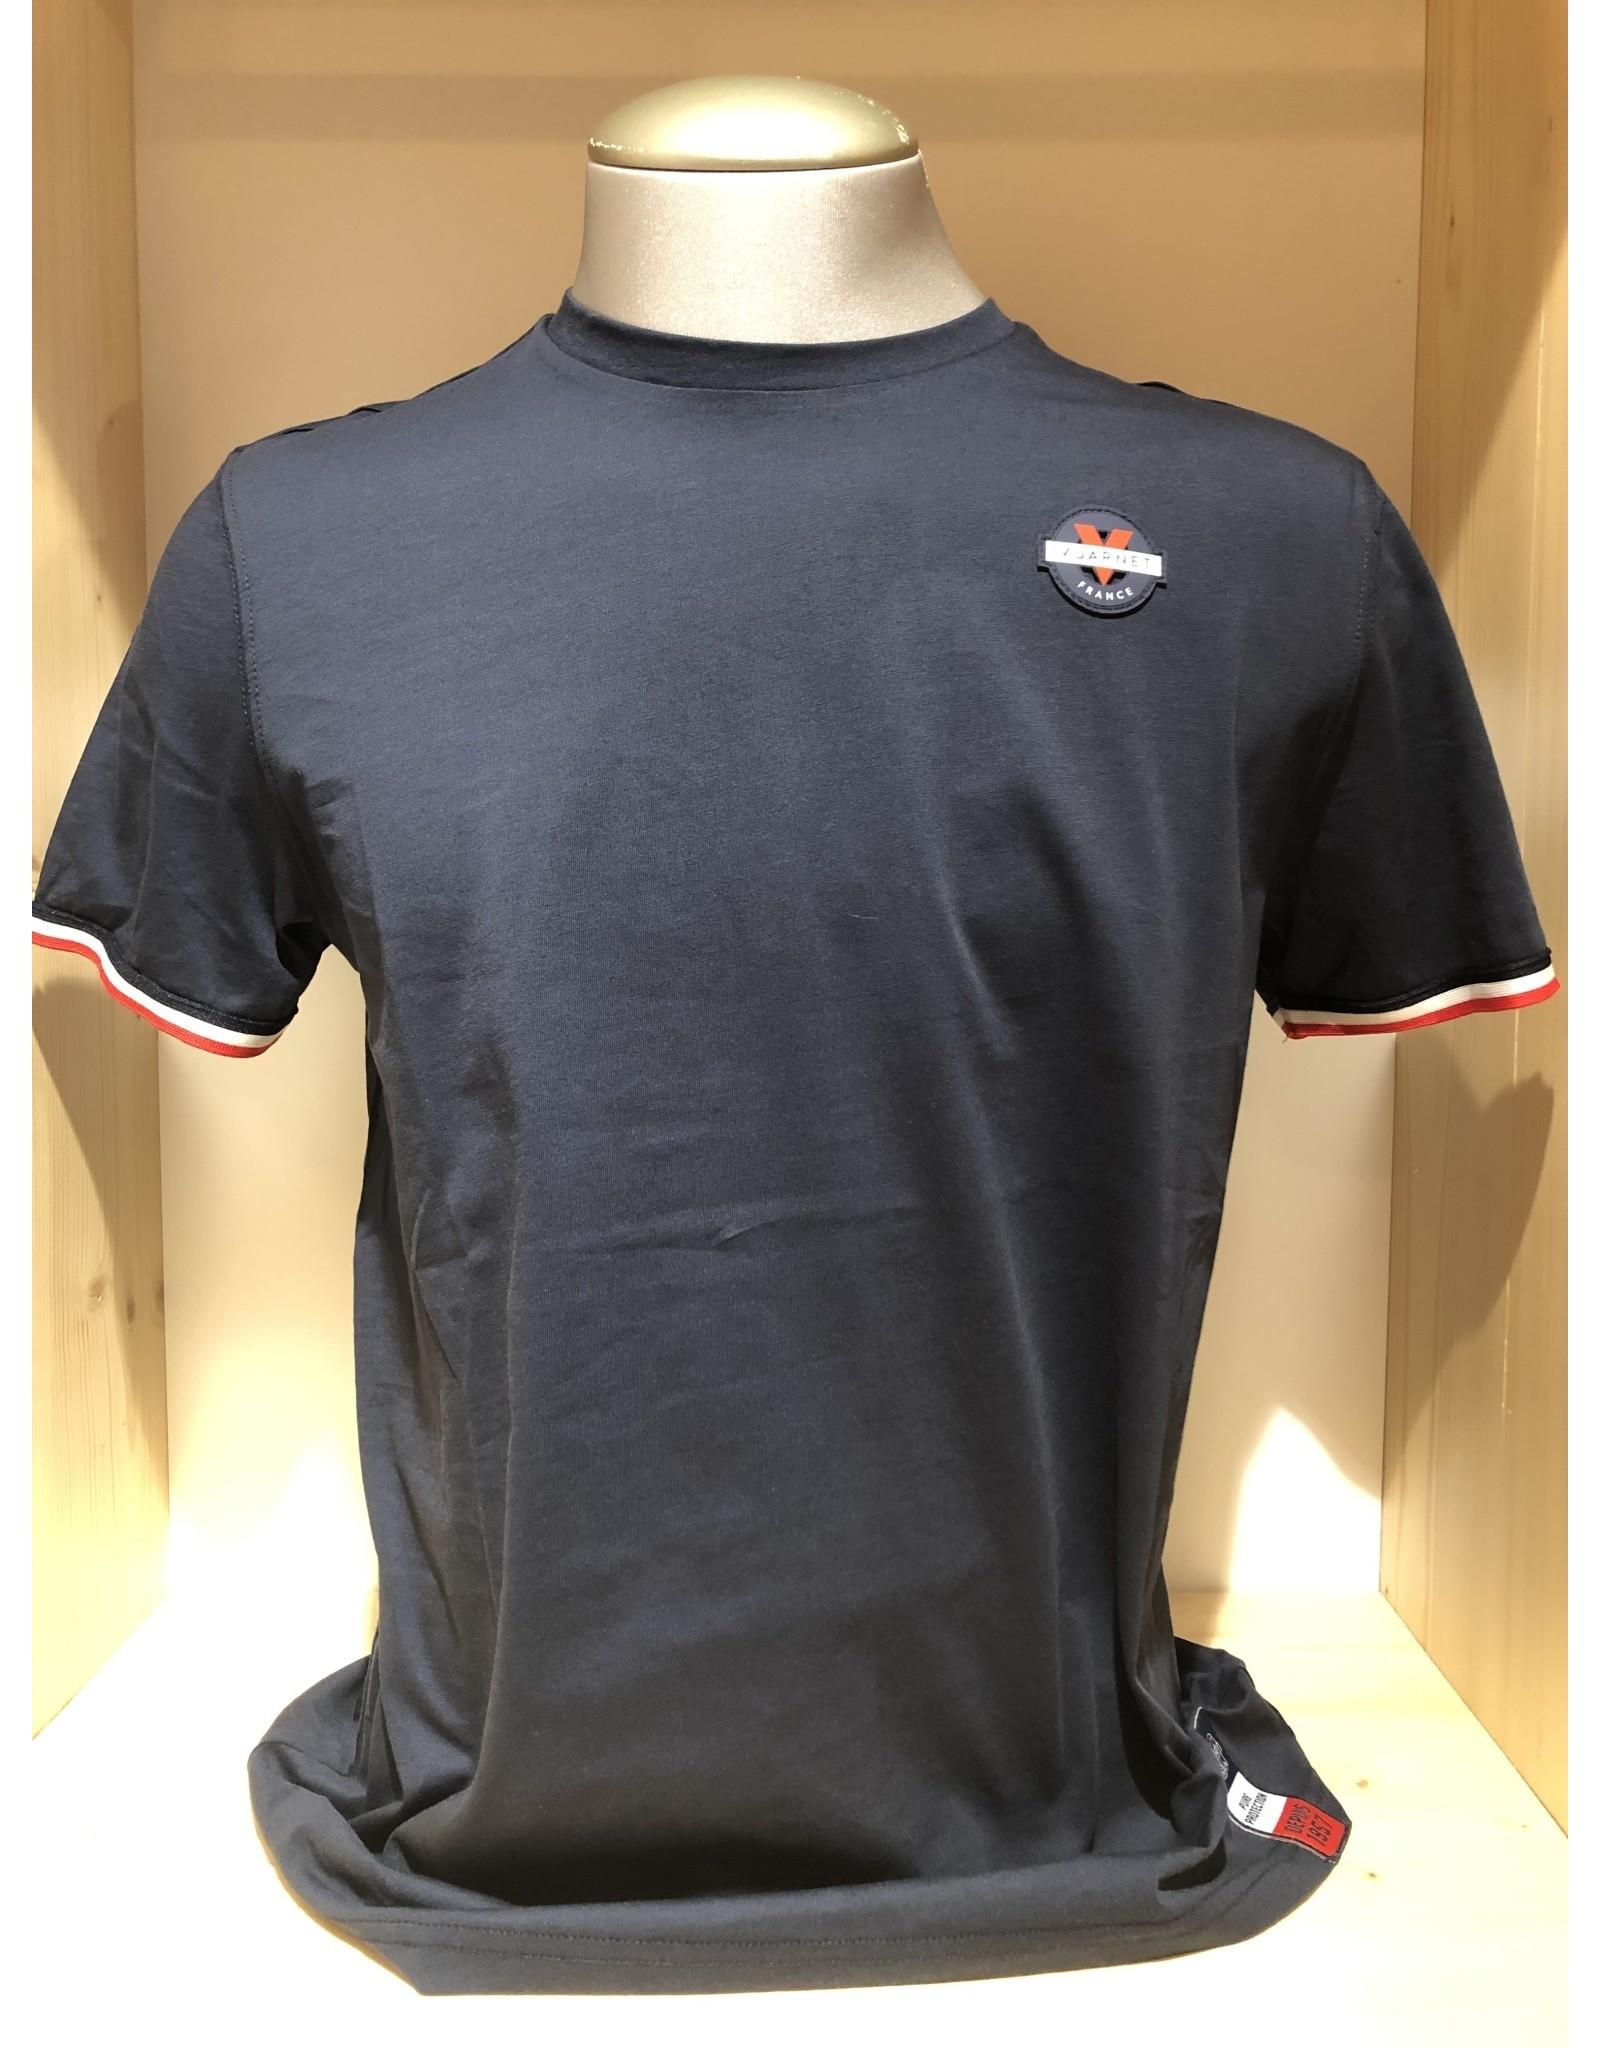 vuarnet Vuarnet - T-Shirt Homme Ionio Deep Navy